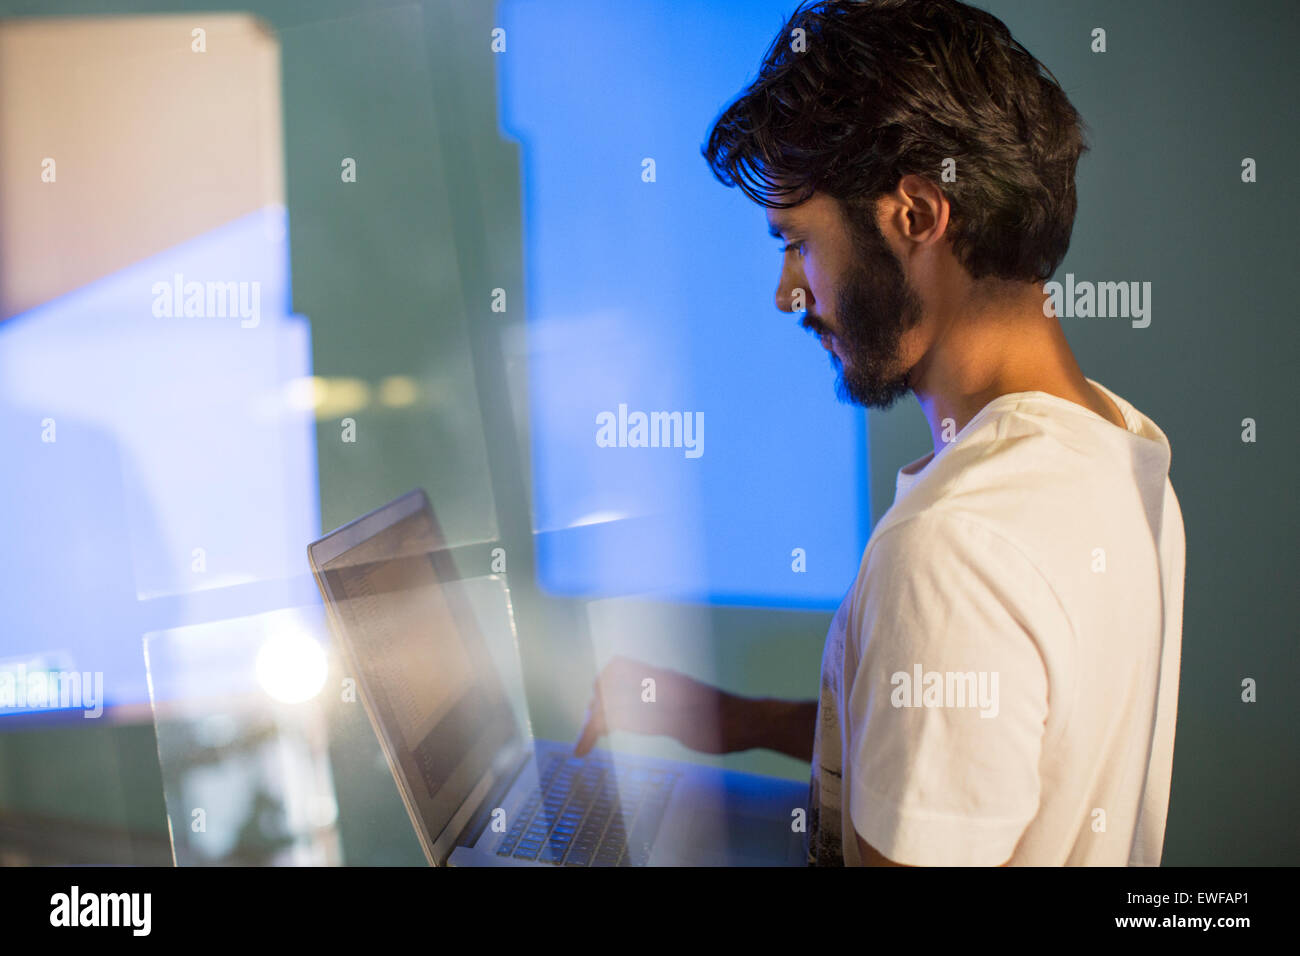 Casual businessman with laptop preparing audio visual presentation - Stock Image